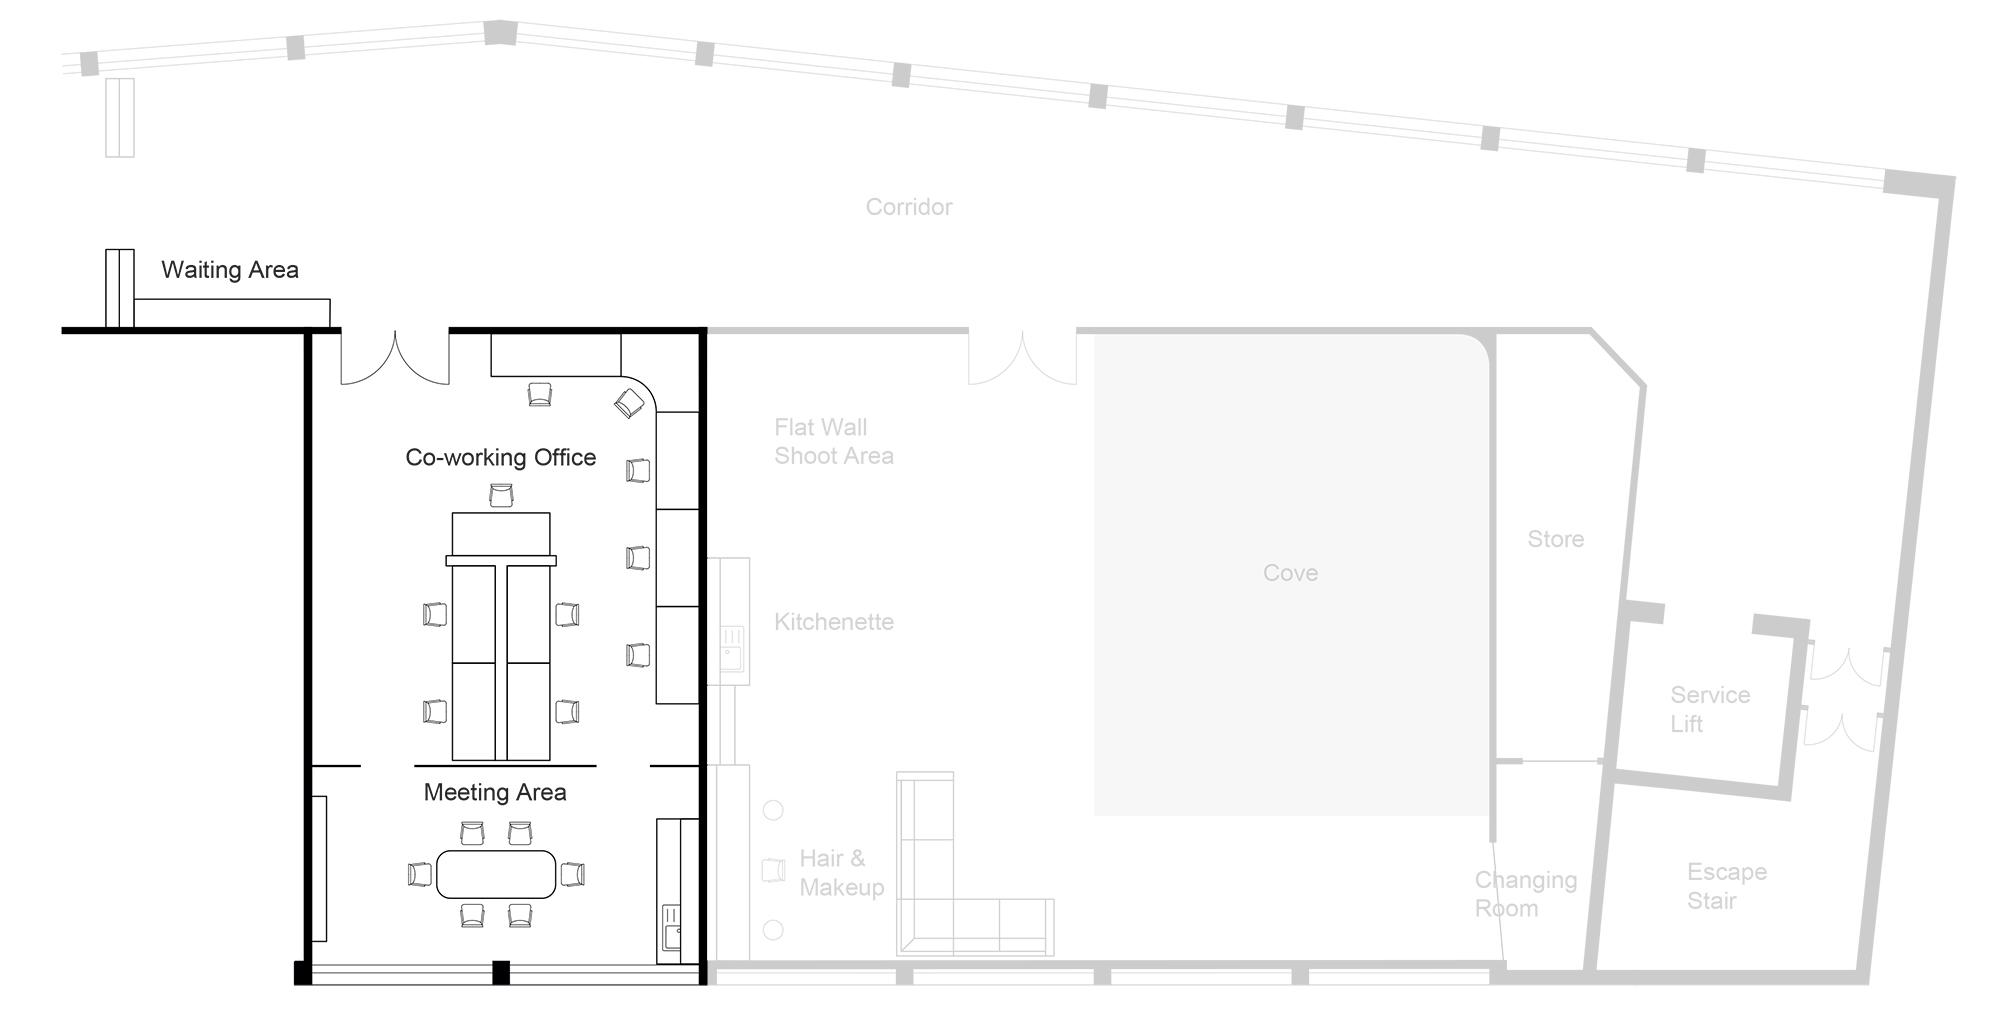 Broadscope Floor Plan for Desk Space Co-working Office for Rent.jpg